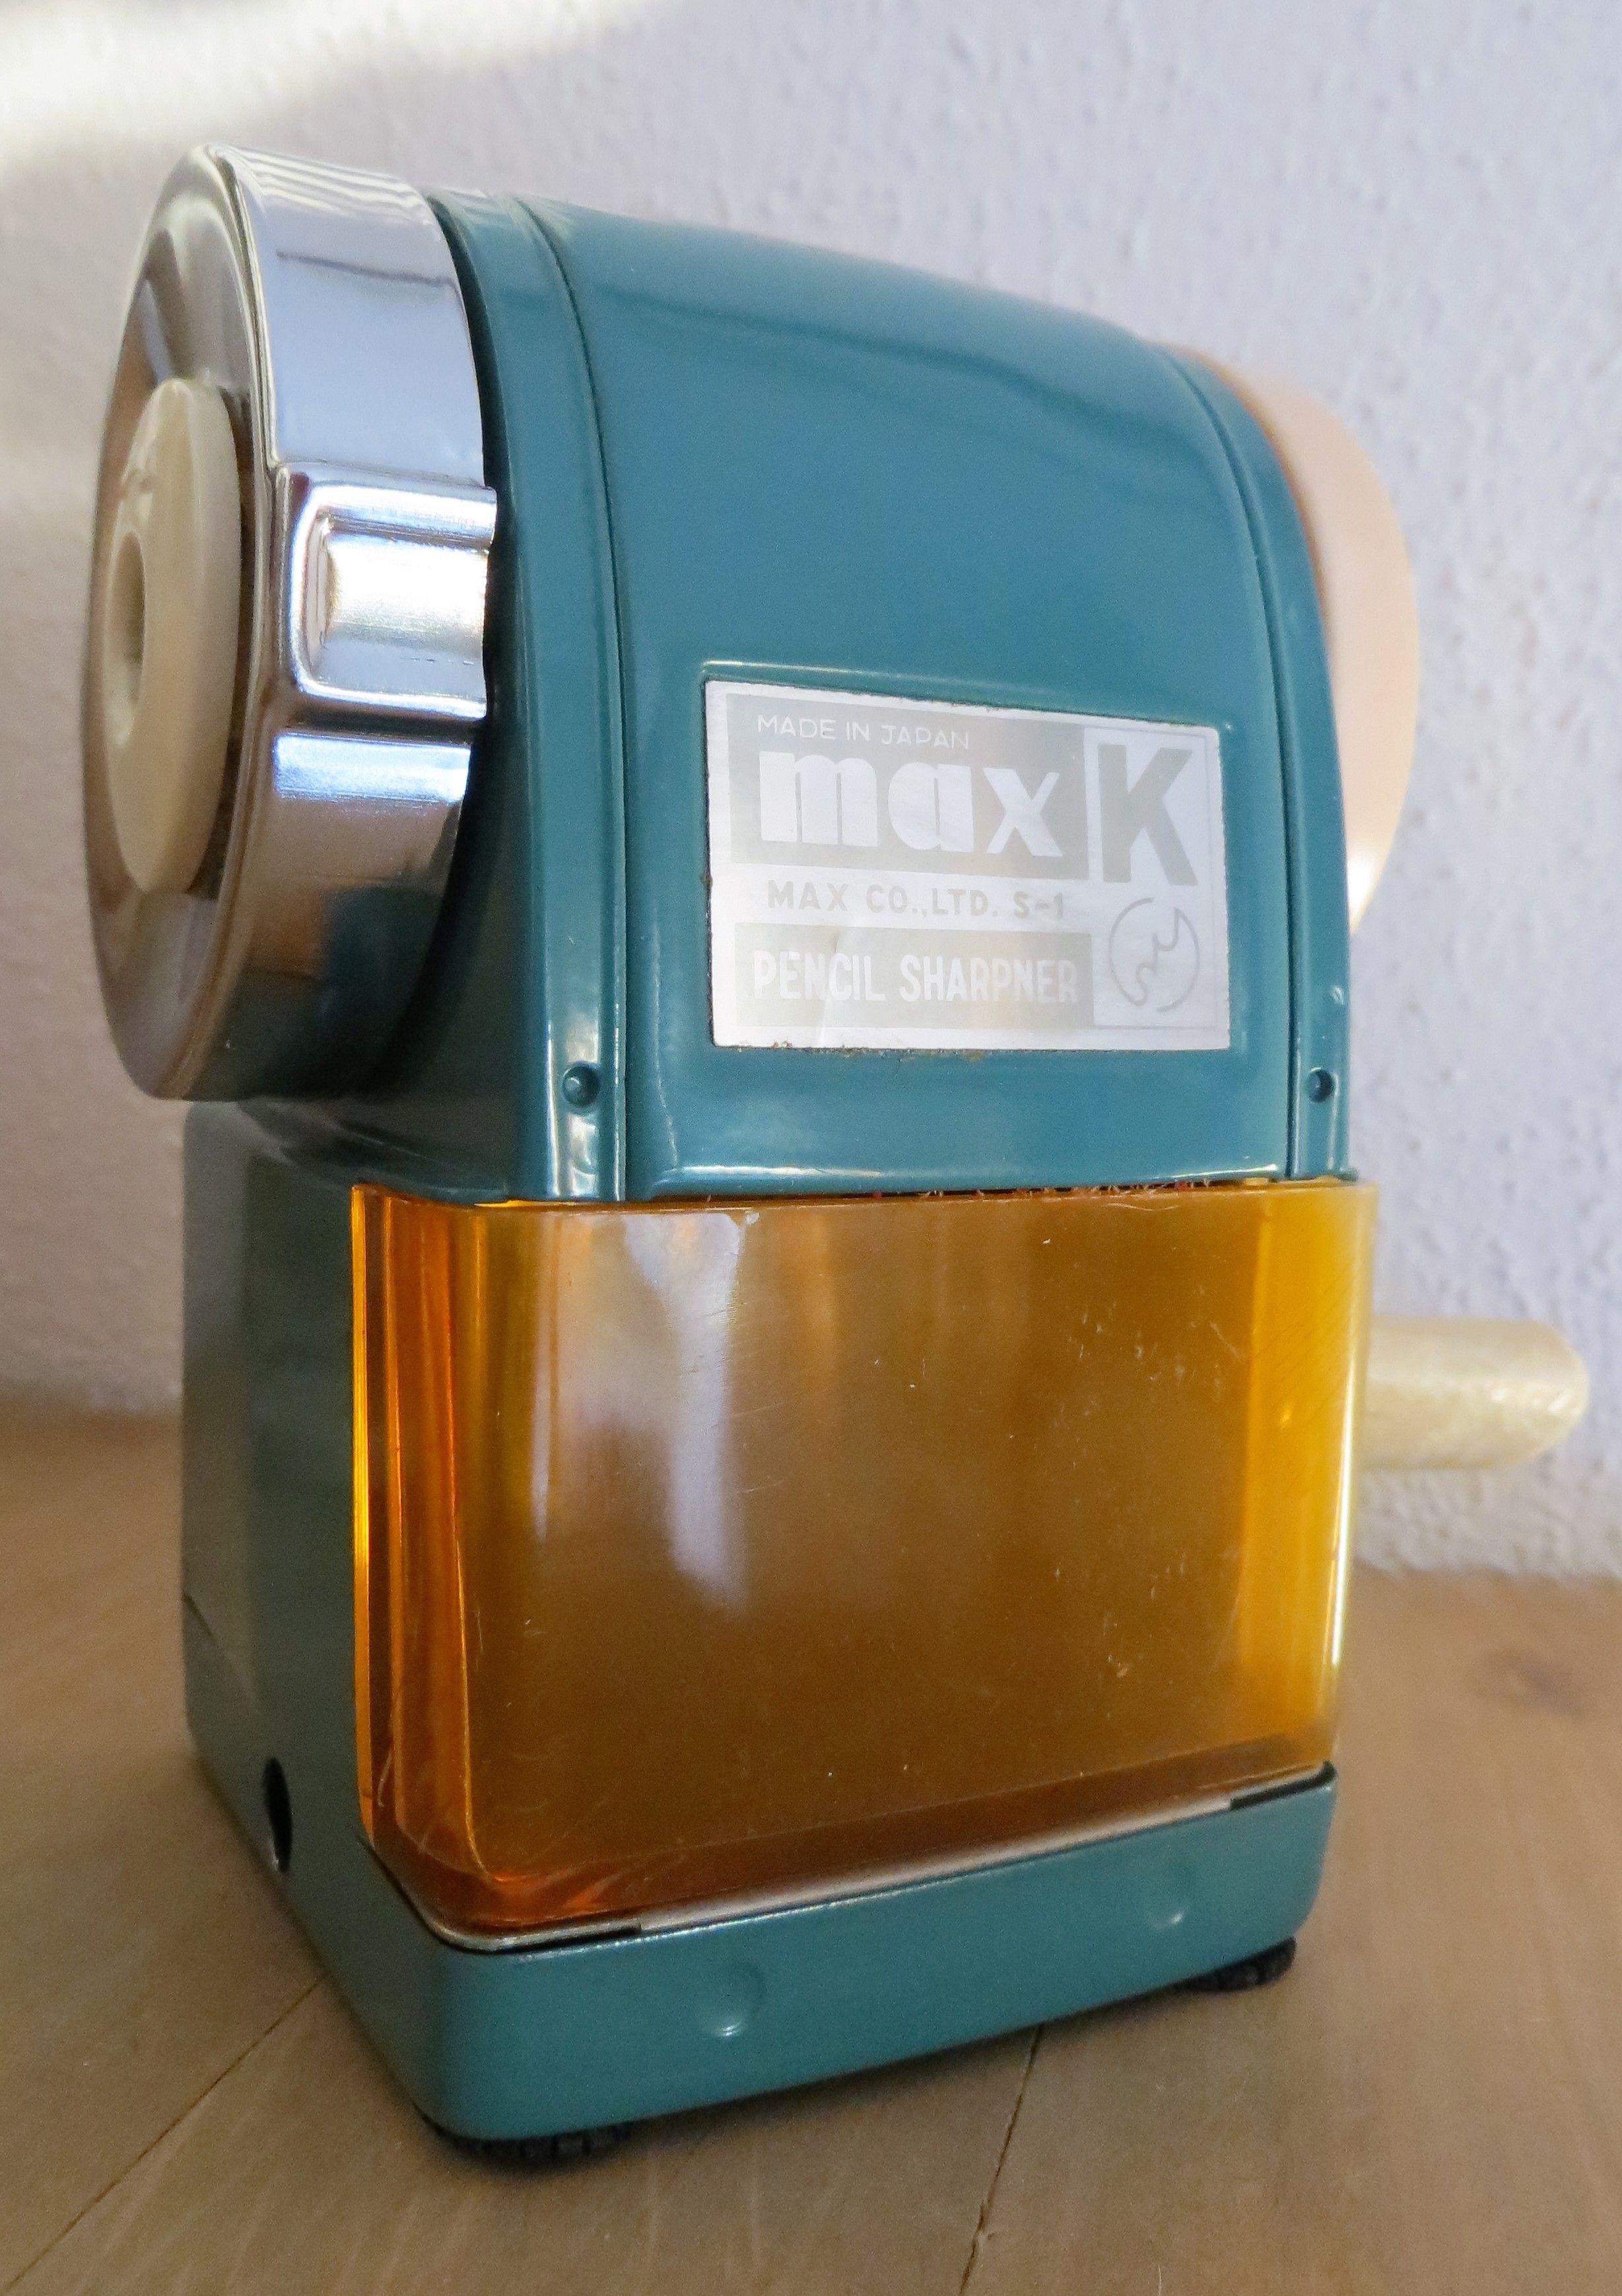 Max k pencil sharpener japan with images pencil